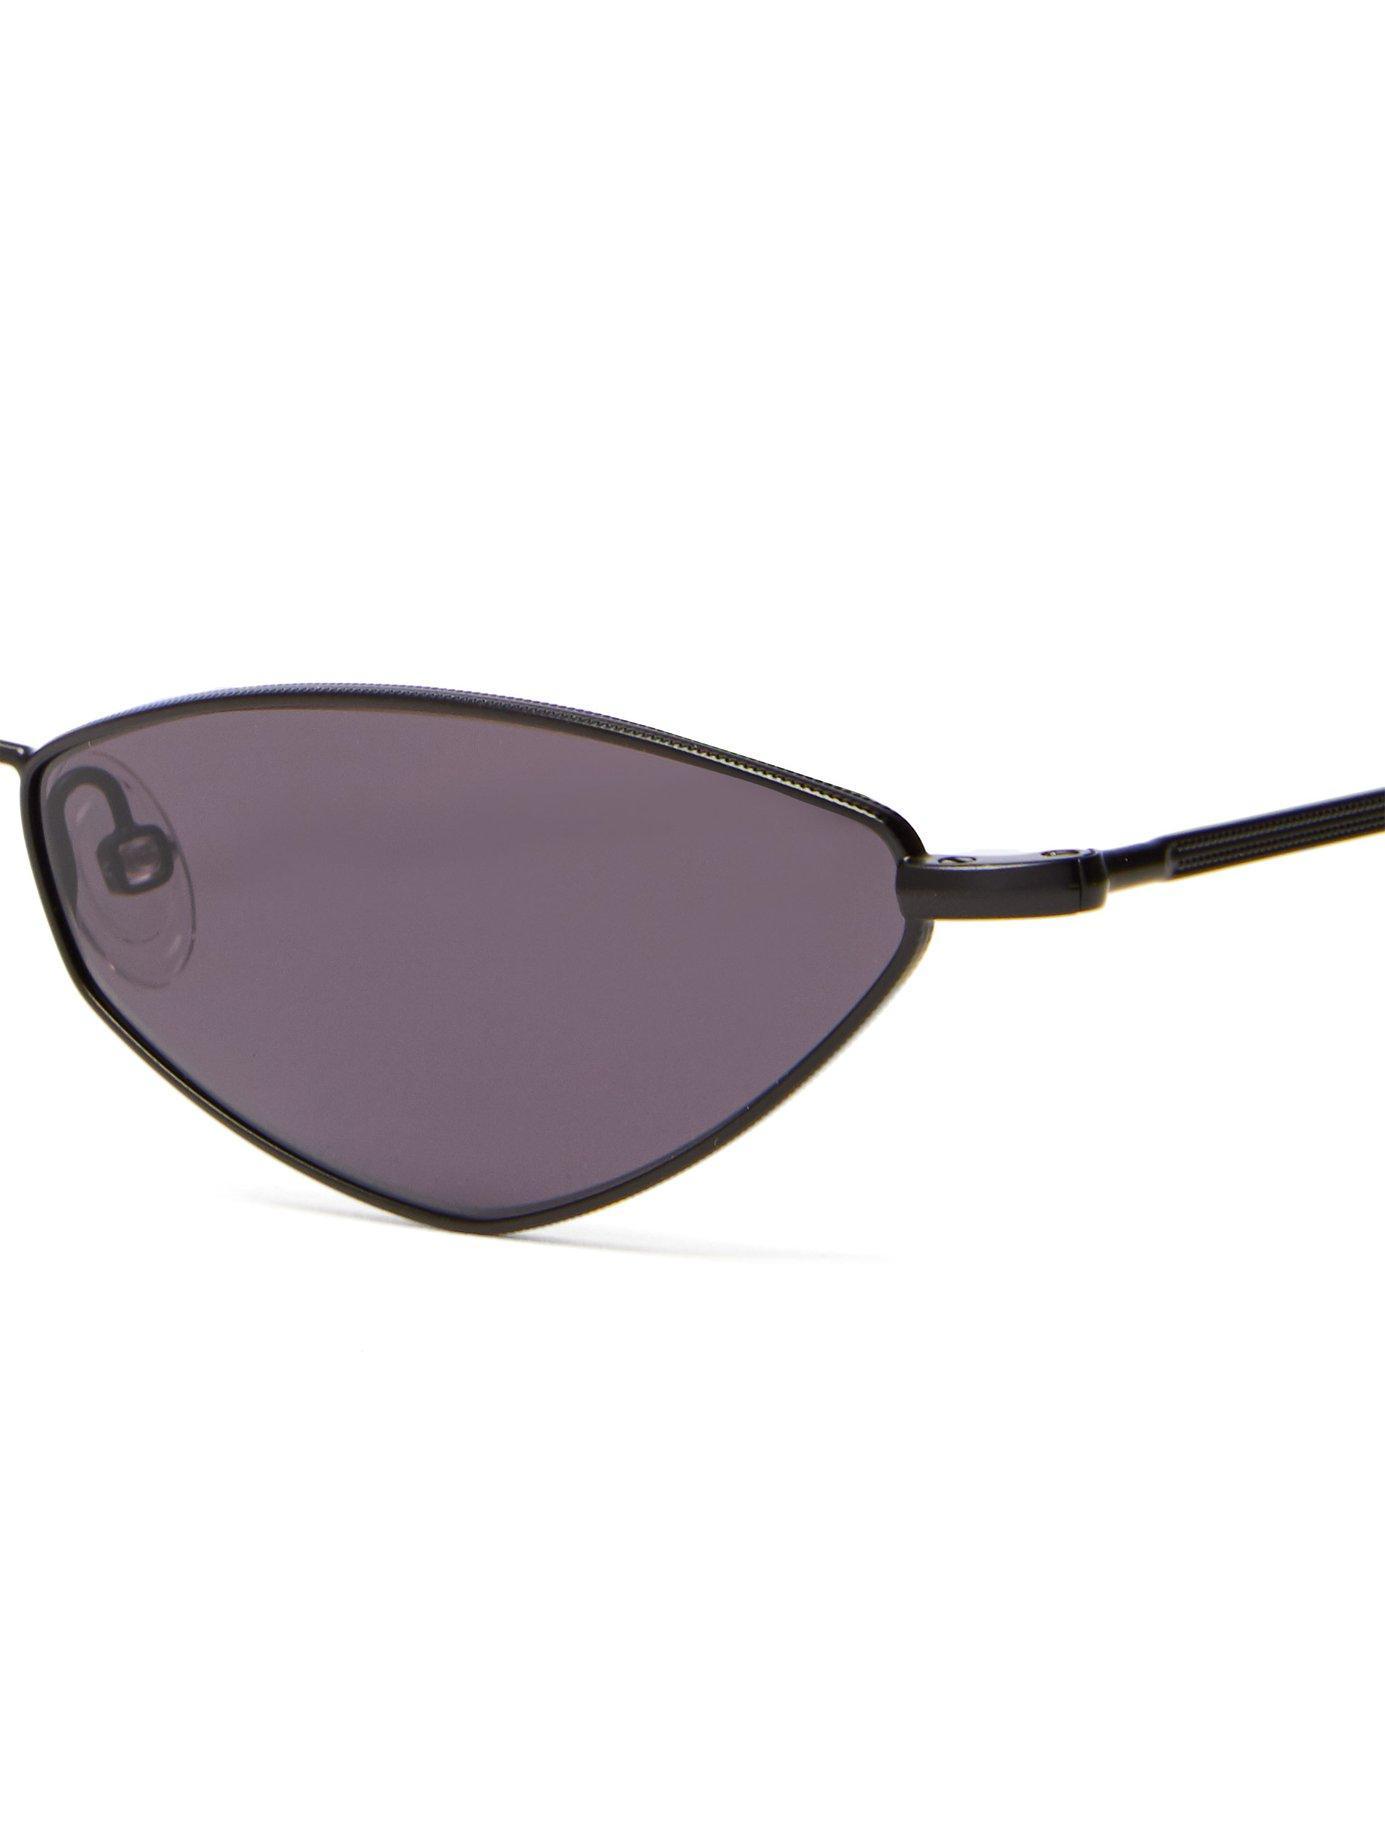 d66311aecbd Lyst - Andy Wolf Eliza Cat Eye Sunglasses in Black for Men